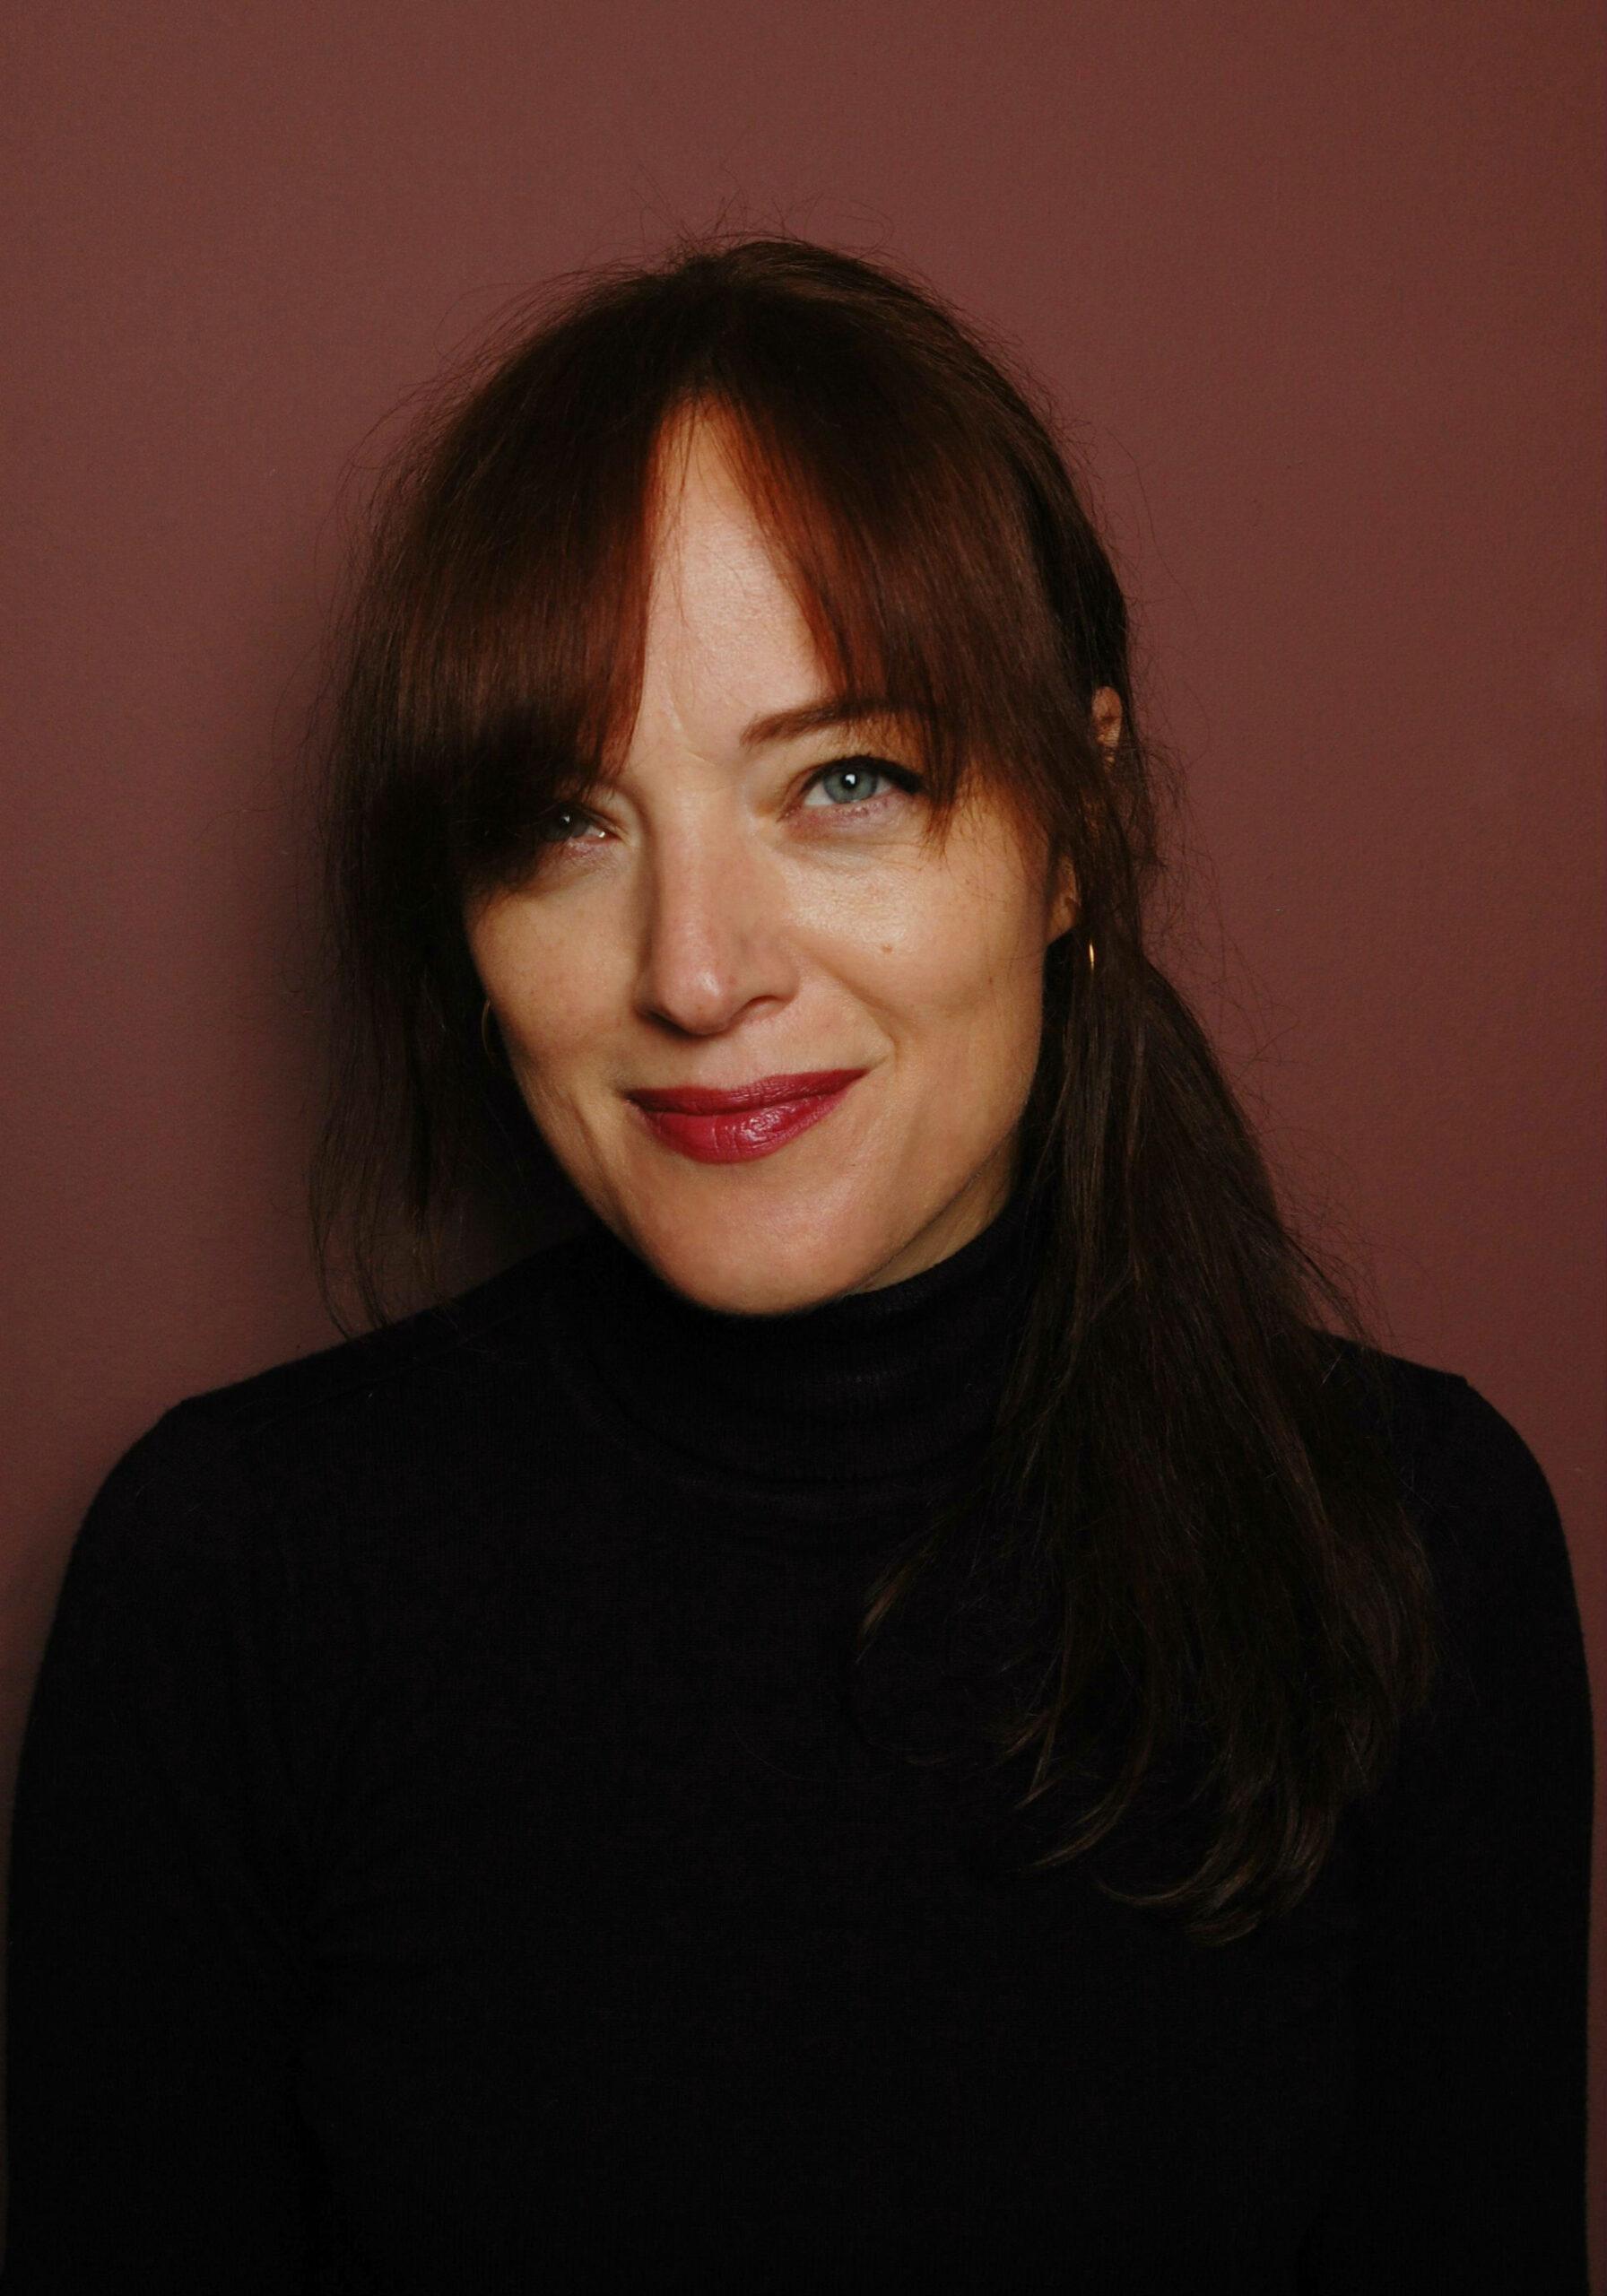 Velvet Morning af Trine Bøhm, roman - YA